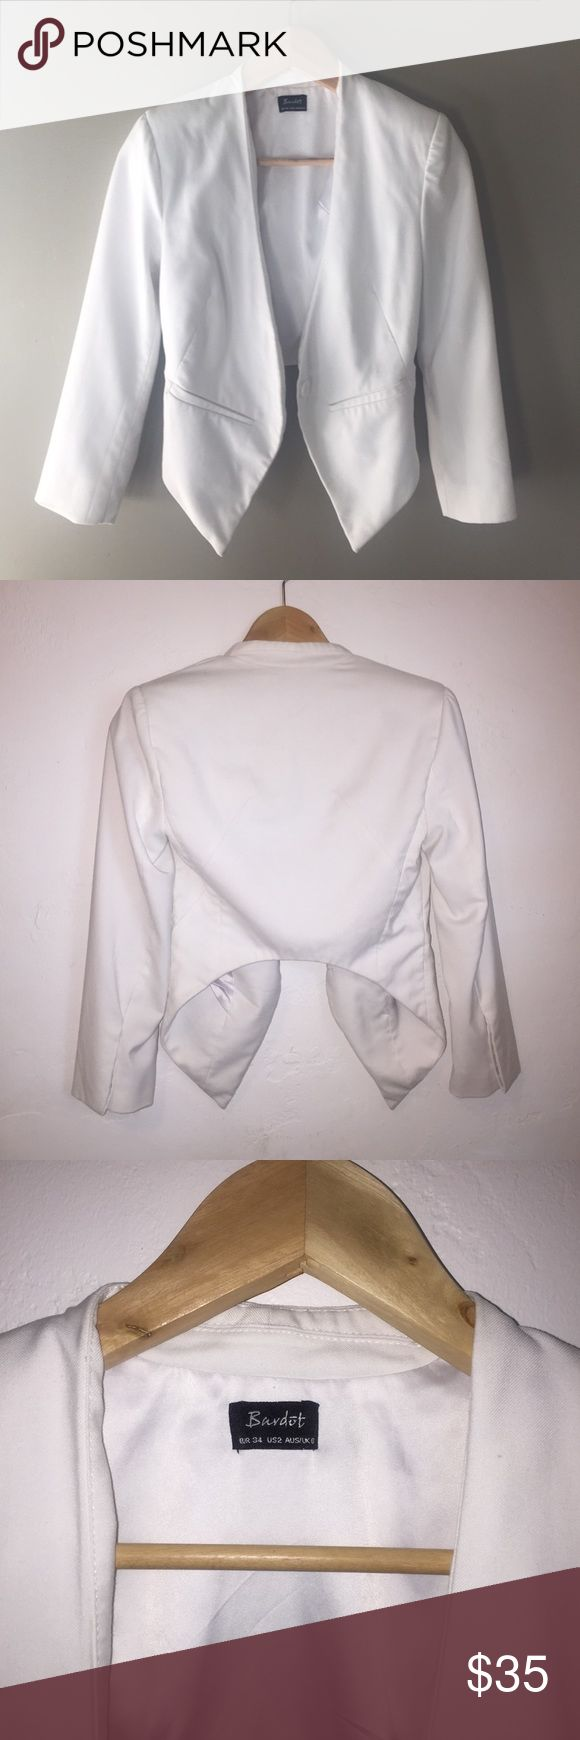 ✨ FLASH SALE ✨ White Bardot Blazer Great condition! US size 2 but would fit a XS. Such a unique cut 😍 Bardot Jackets & Coats Blazers